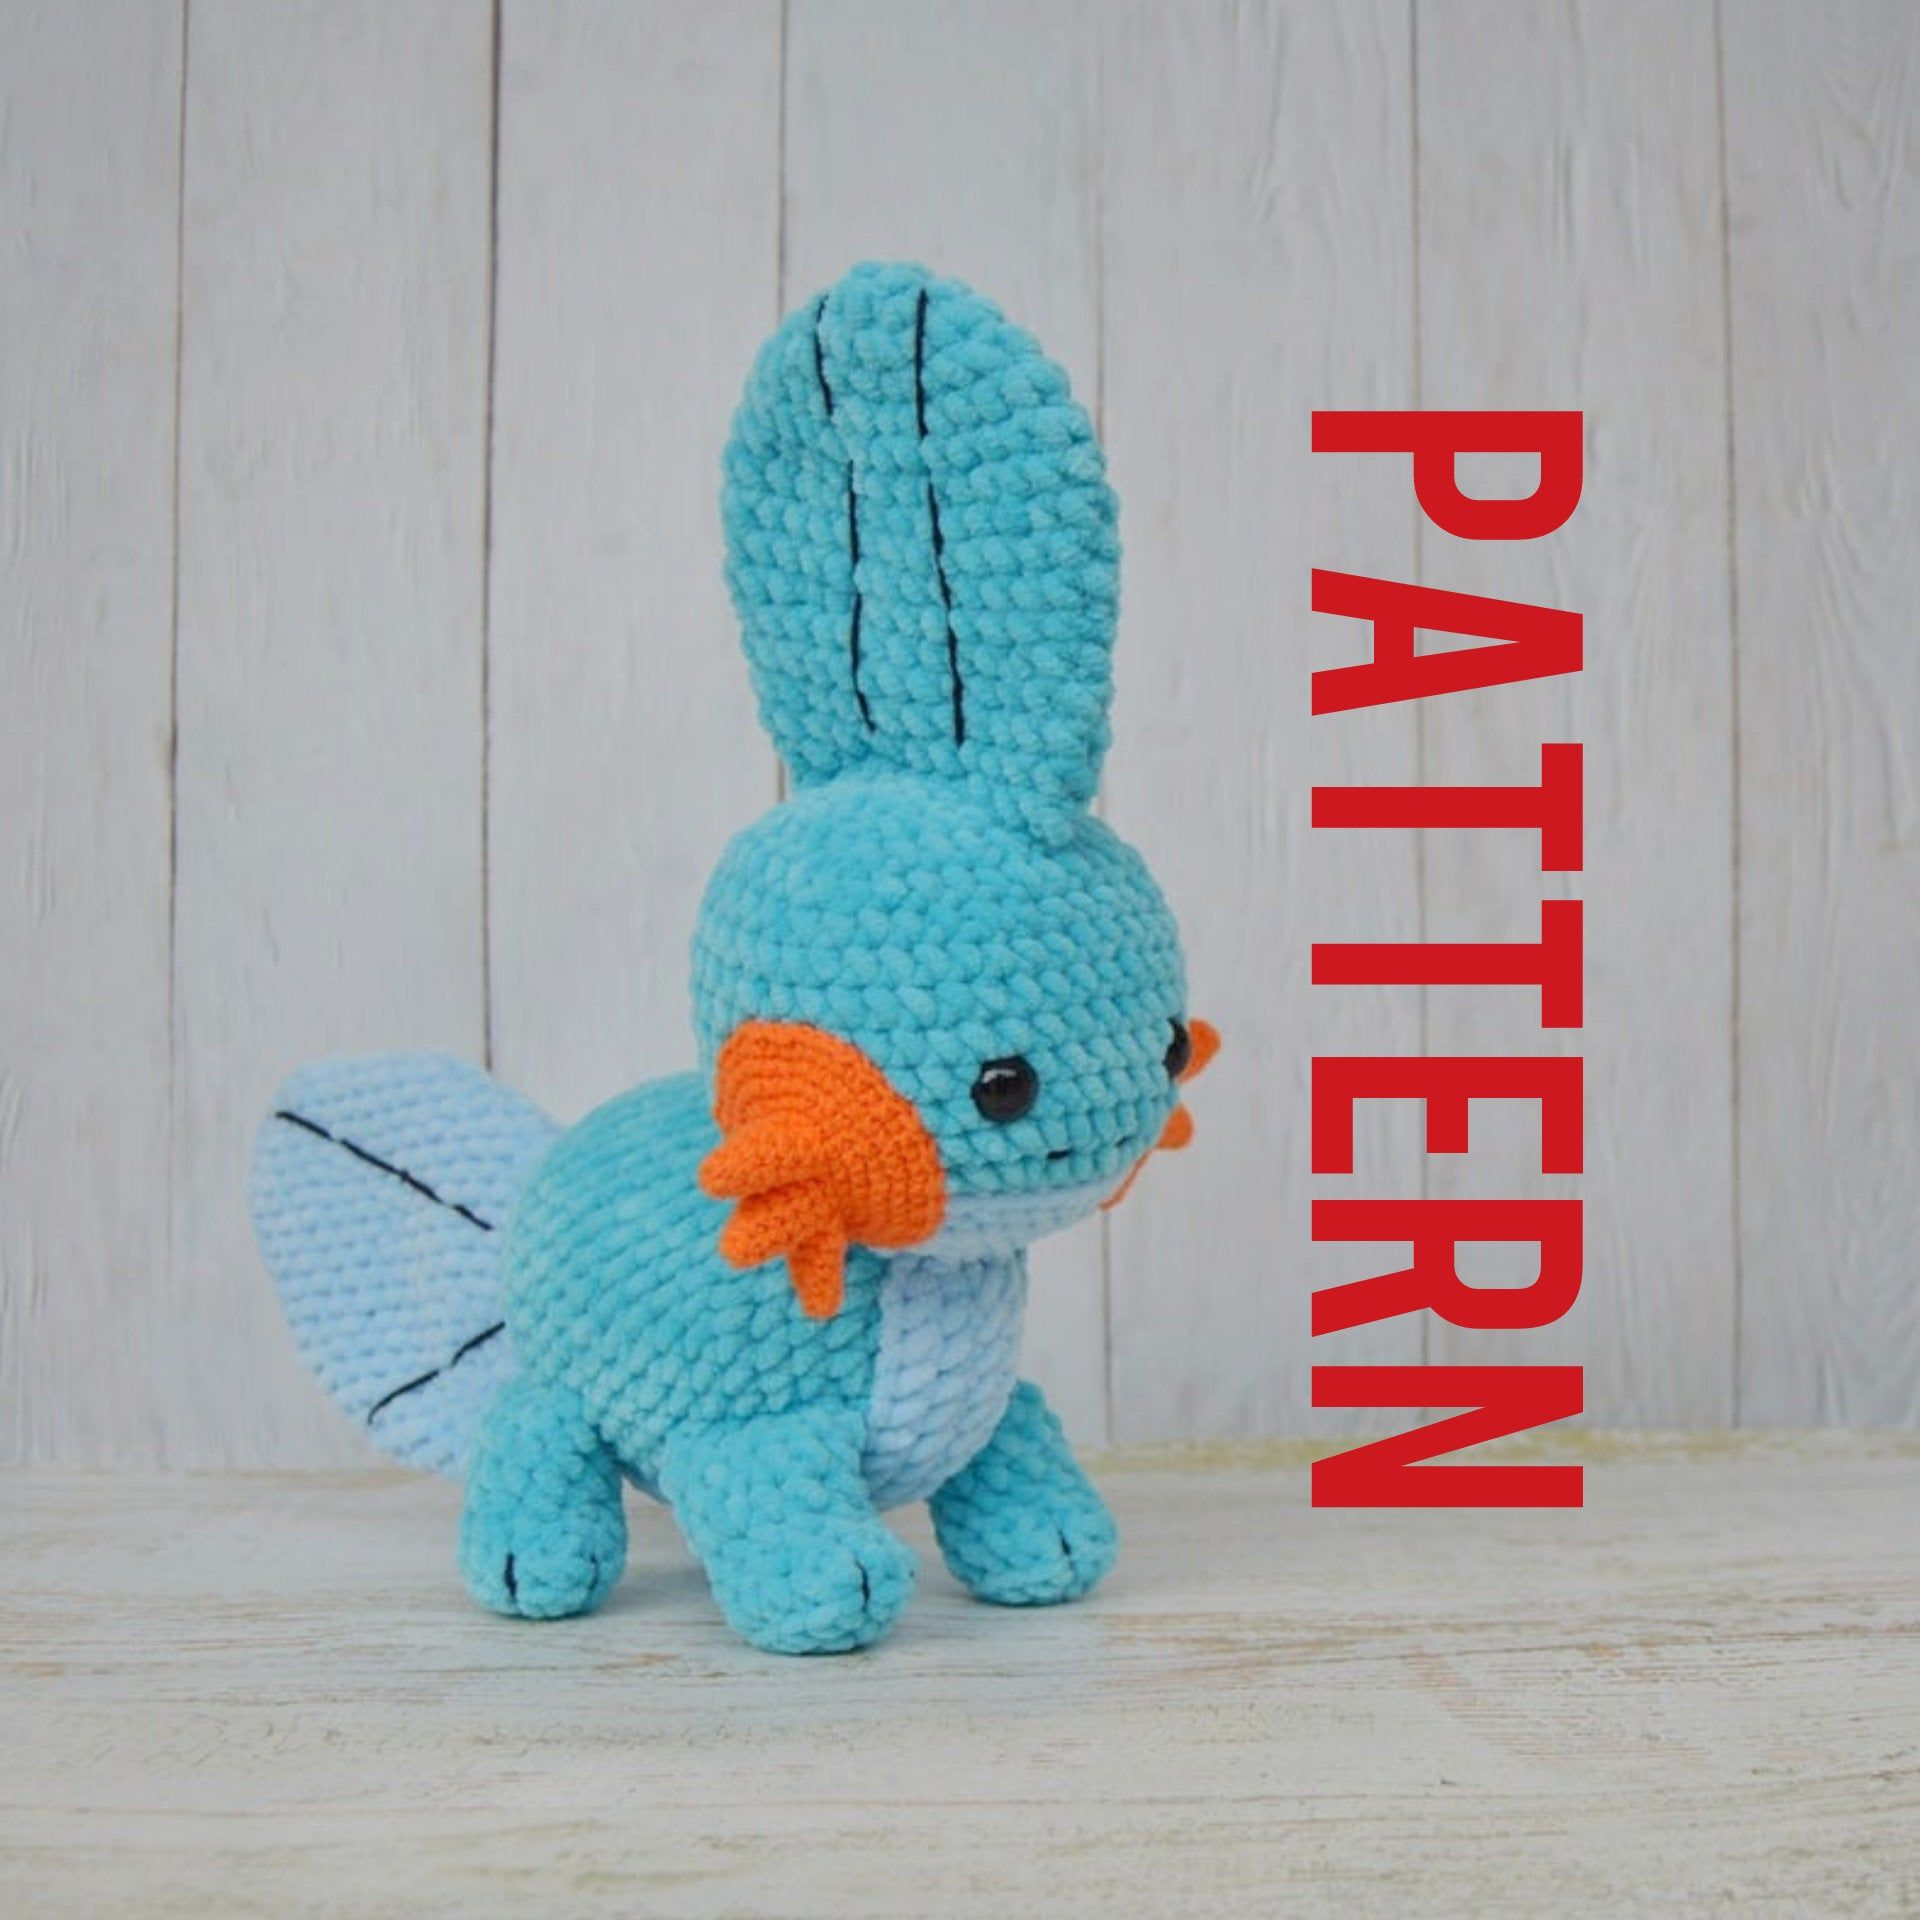 Free Pokeball Key Chain Crochet Pattern – Crafting For My Sanity | 1920x1920